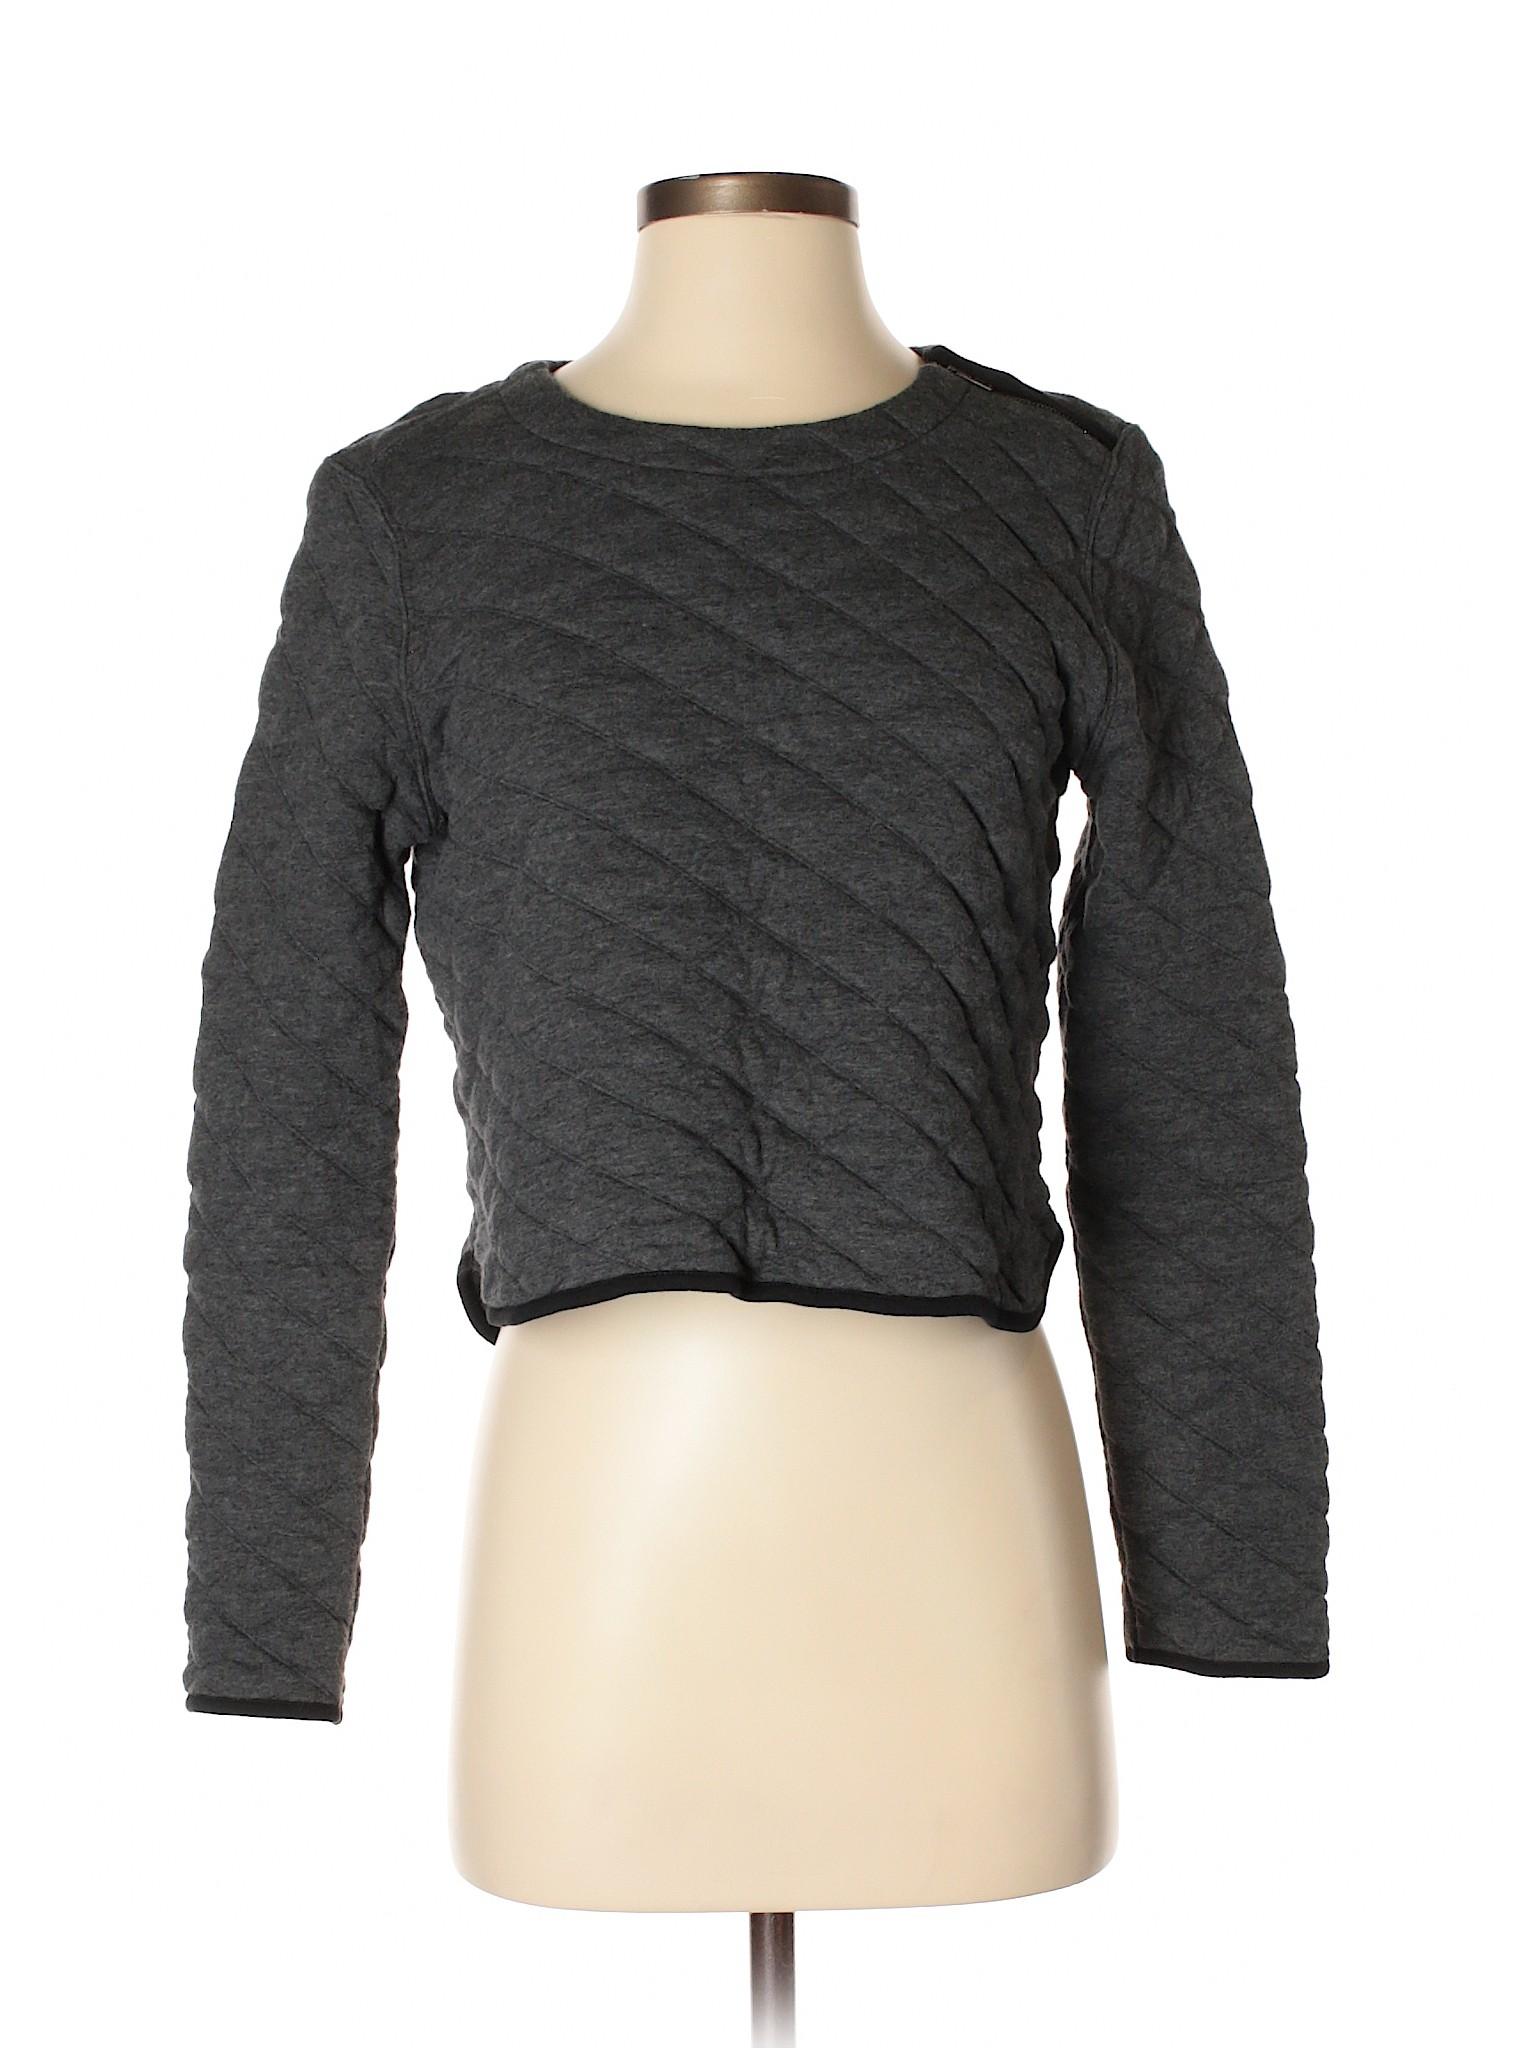 Künstlerisch Moderne Pullover Beste Wahl Sweater Winter Madewell Winter Boutique Boutique Madewell